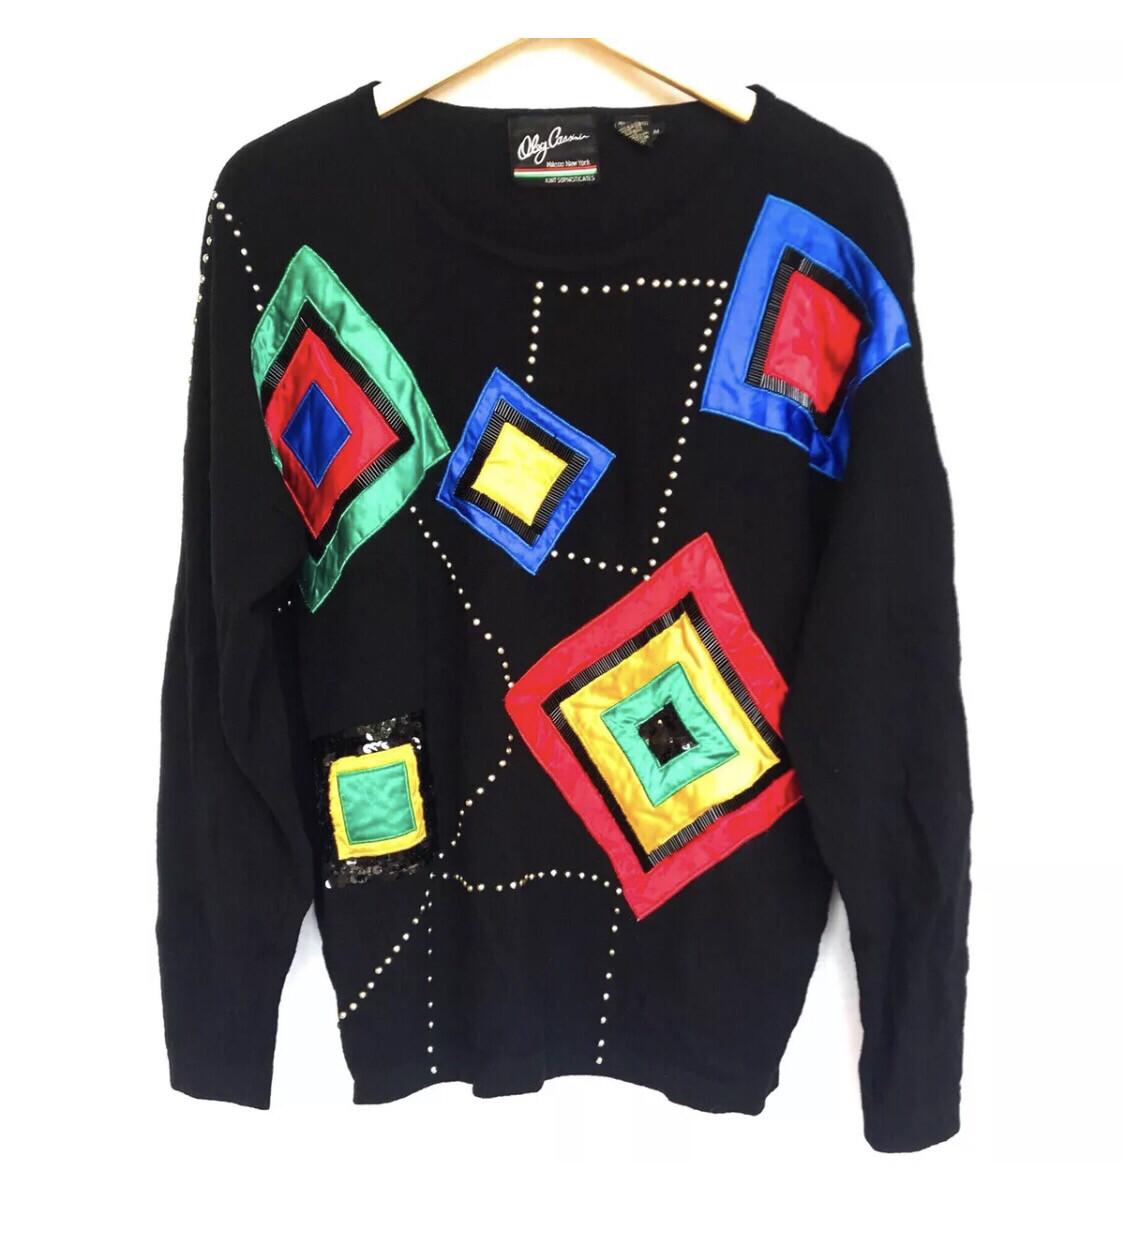 Colorful Diamond Sequin Sweater - M/L